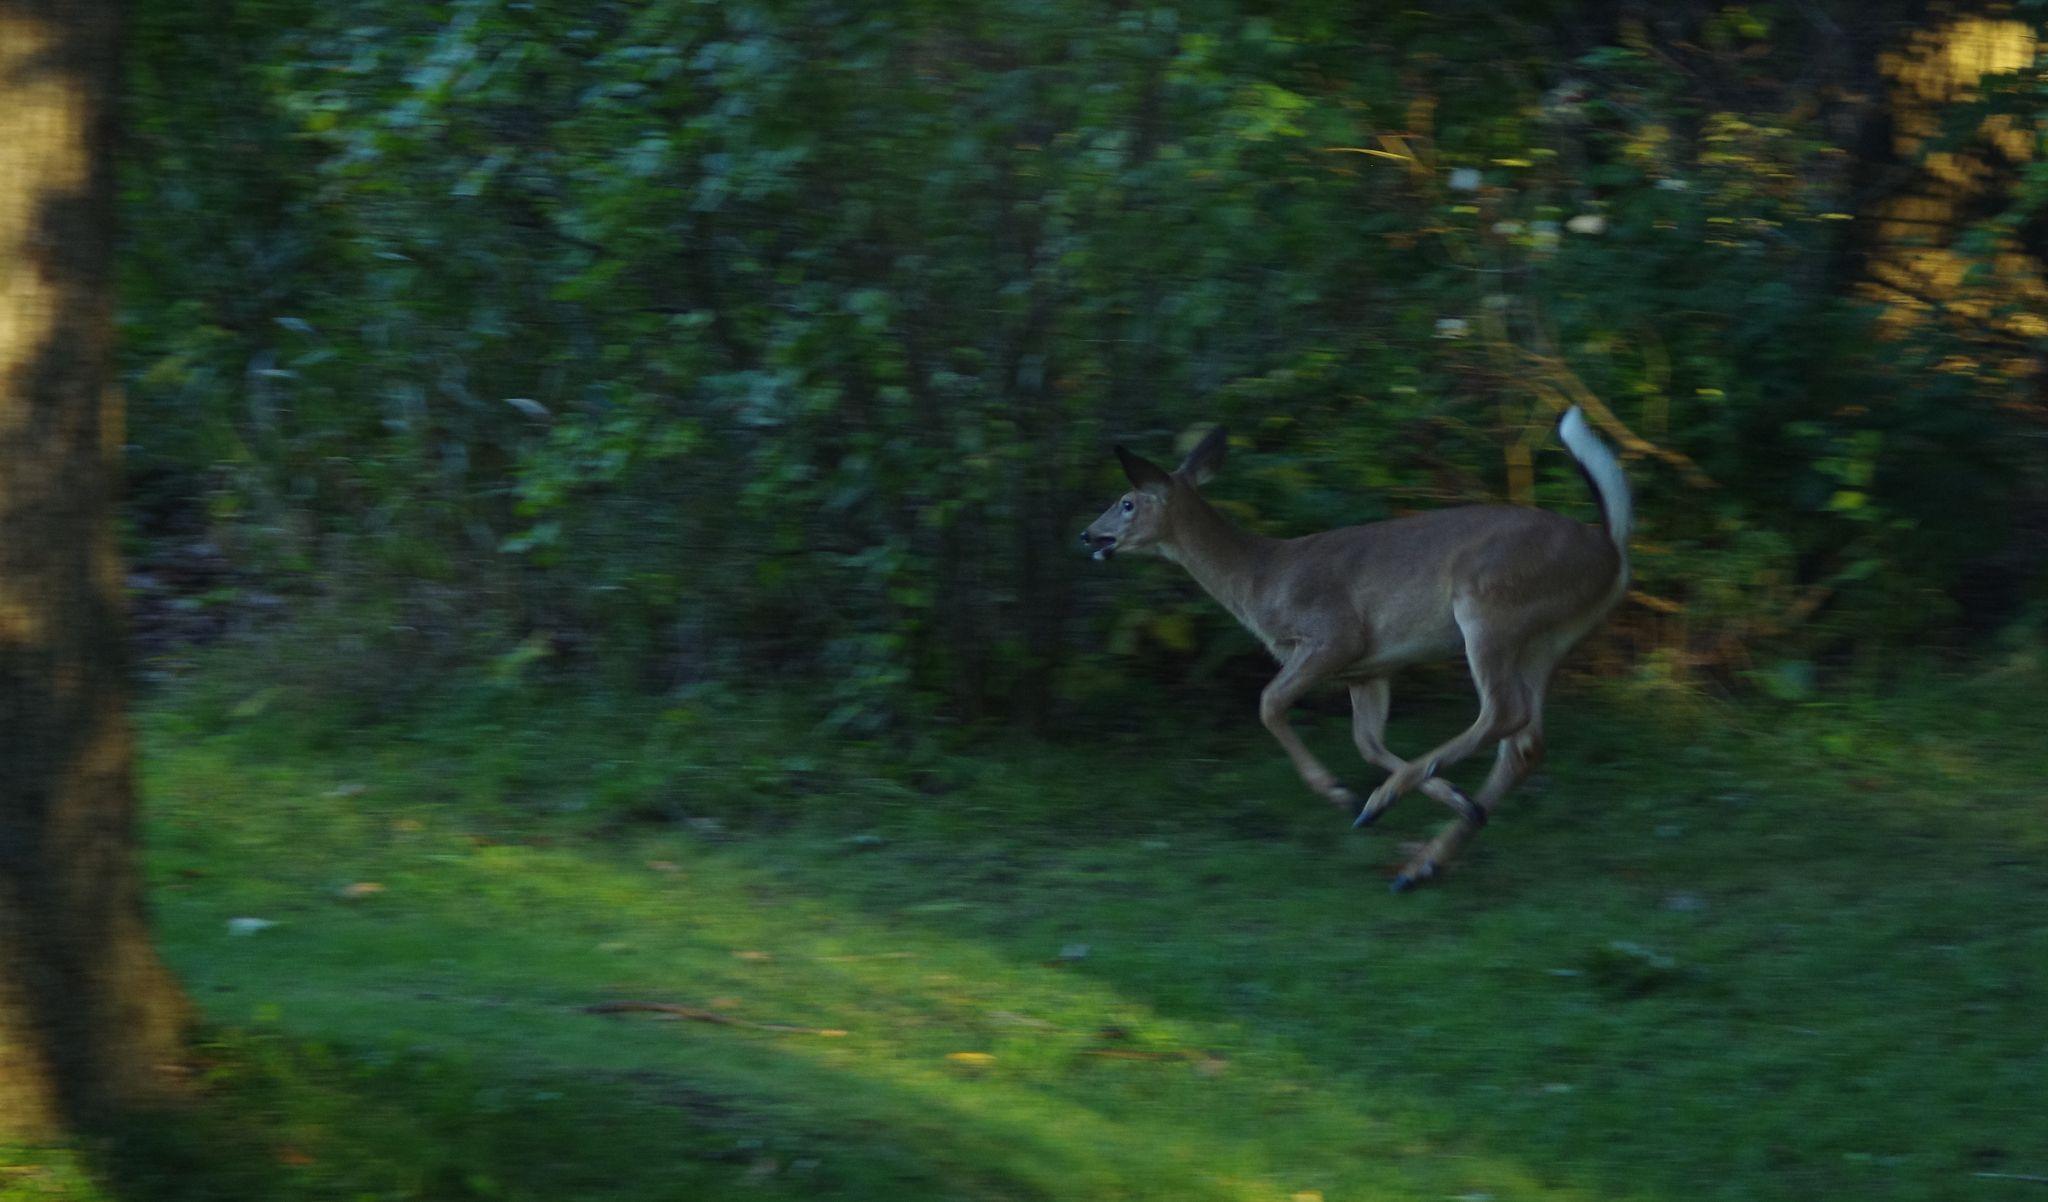 Deer running by Fernanda Caleffi Barbetta